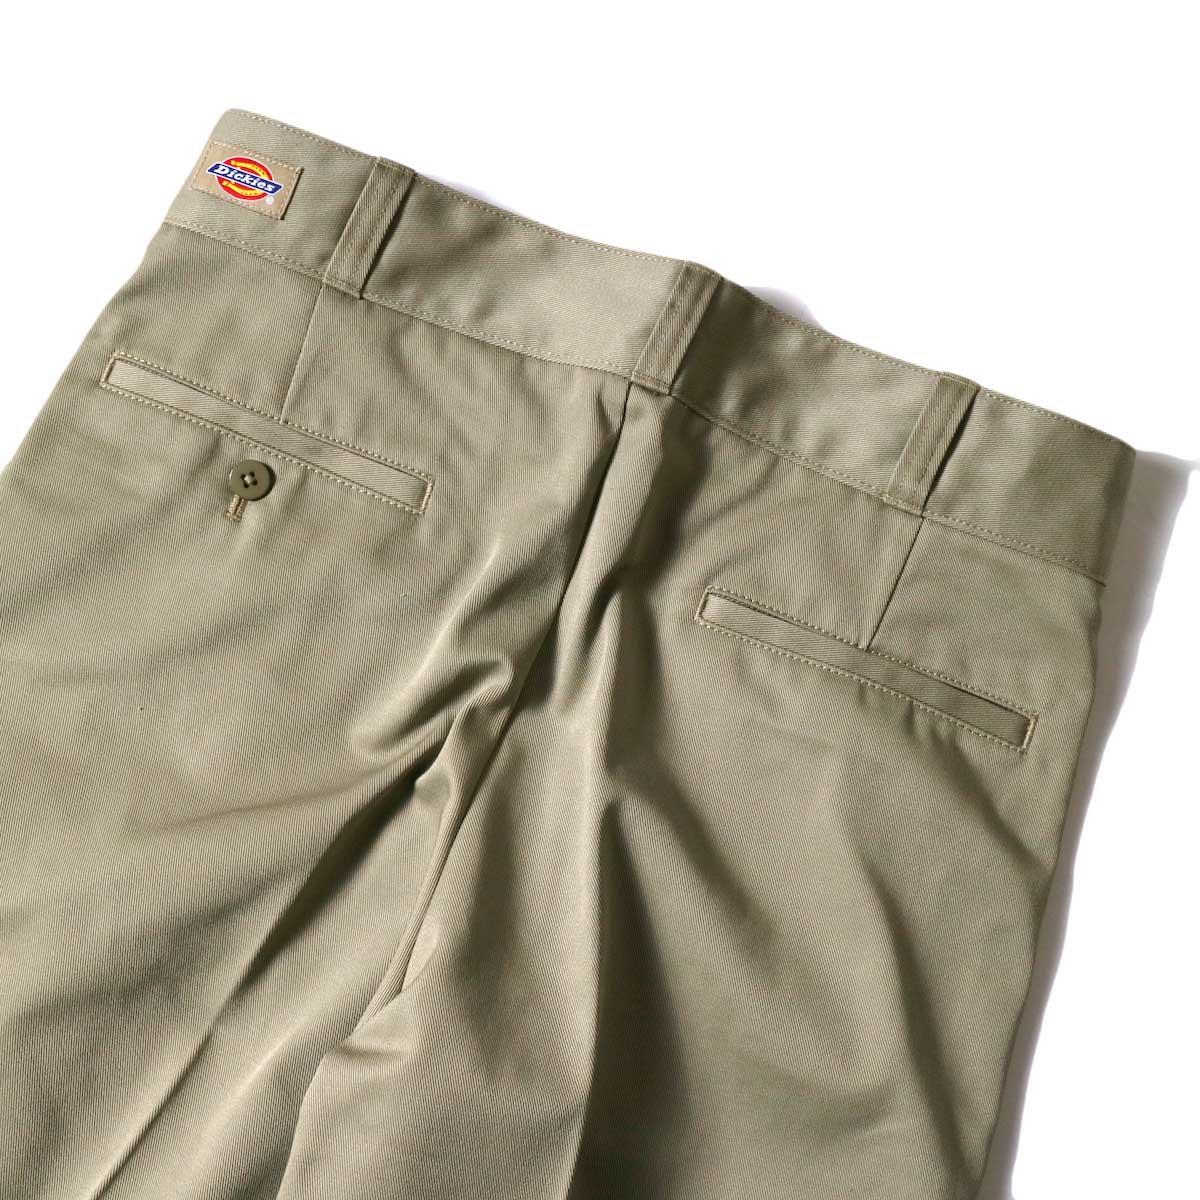 UNUSED / UW0913 Unused x Dickies  2Tuck Pants (Beige) ヒップポケット